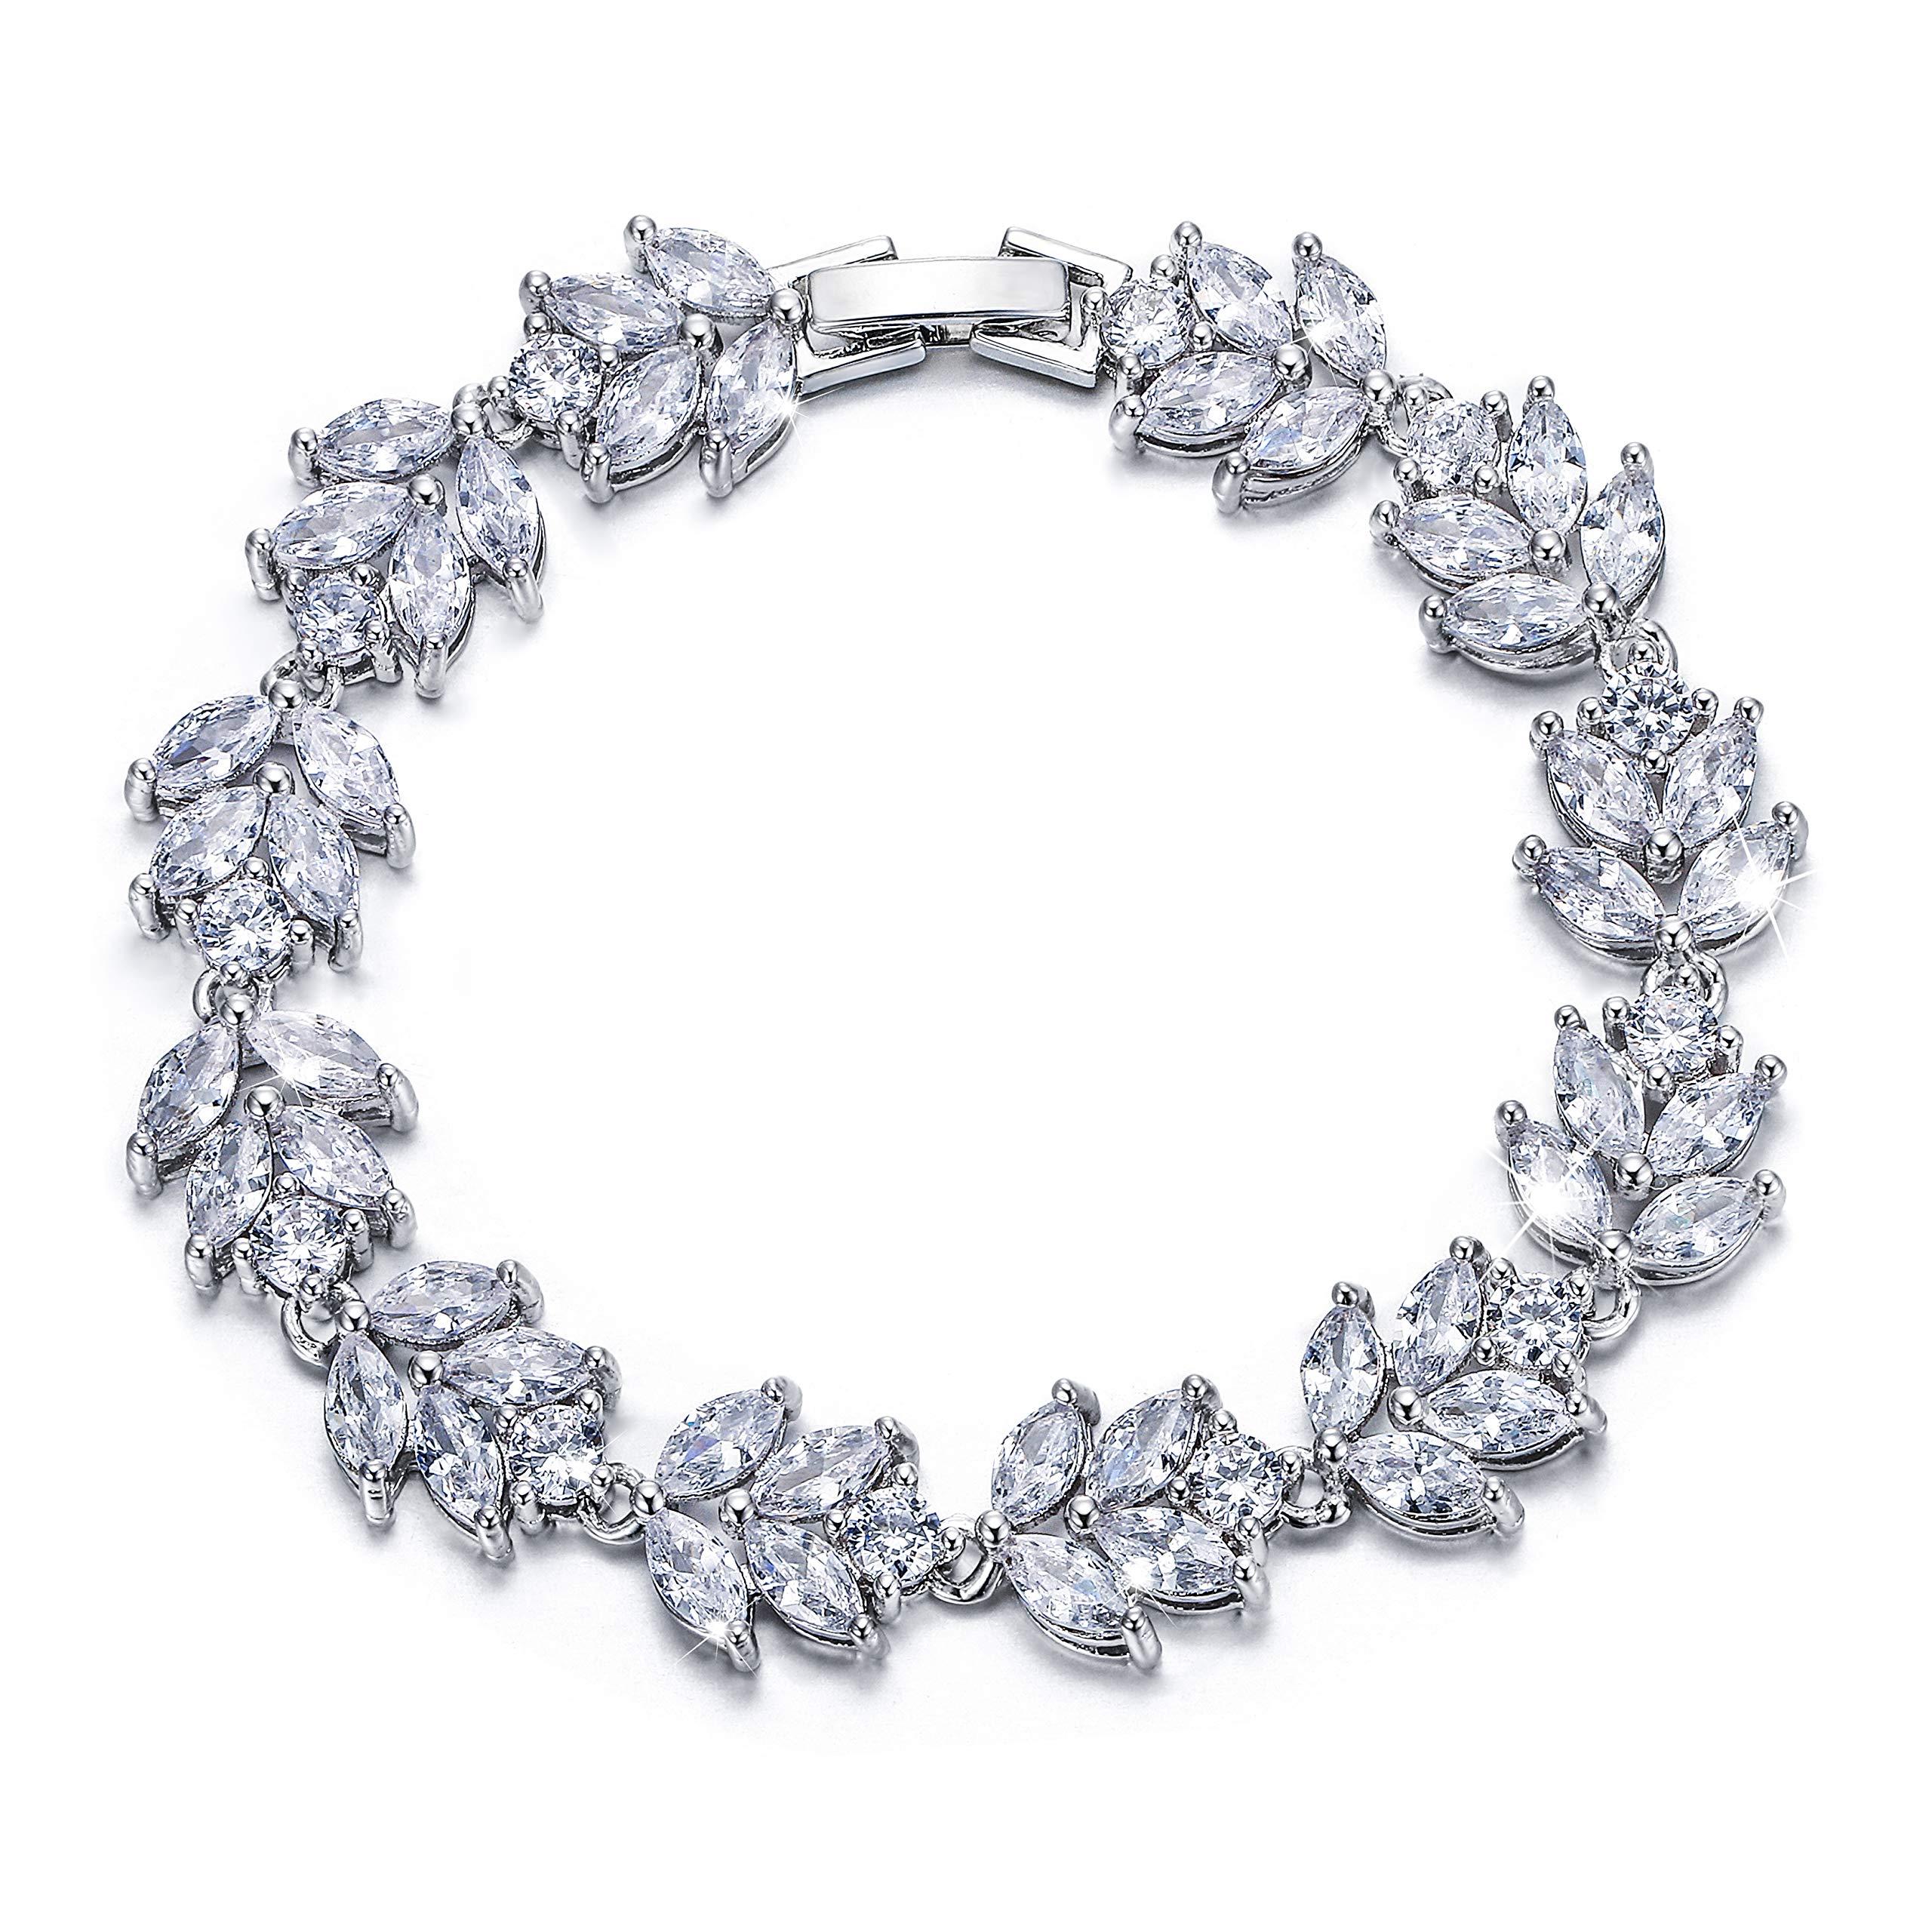 EVER FAITH Silver-Tone Full Cubic Zirconia December Birthstone Leaf Bridal Roman Tennis Bracelet Clear by EVER FAITH